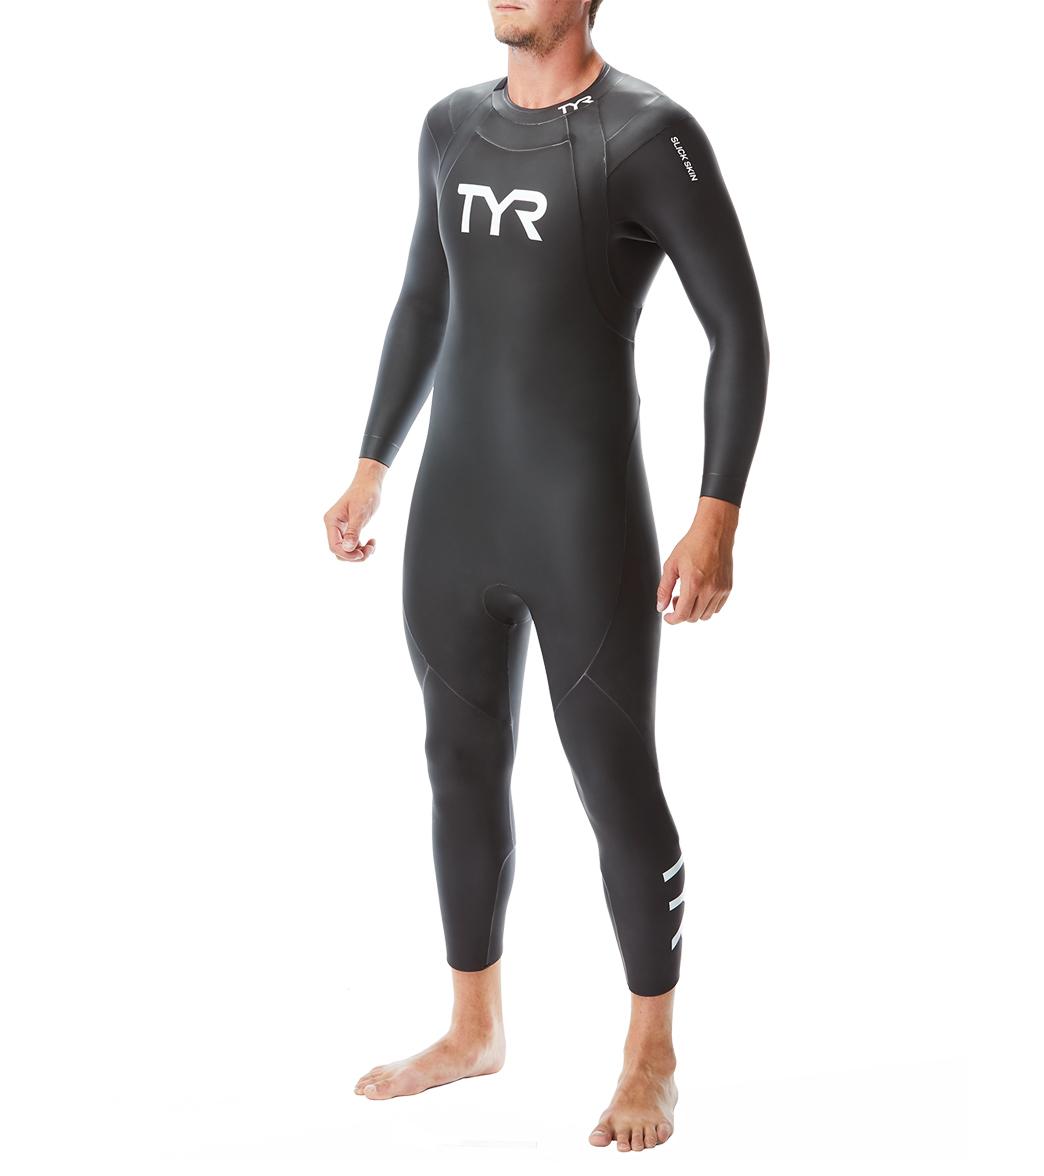 TYR Hurricane Cat 1 Fullsleeve Triathlon Cold Water Wetsuit